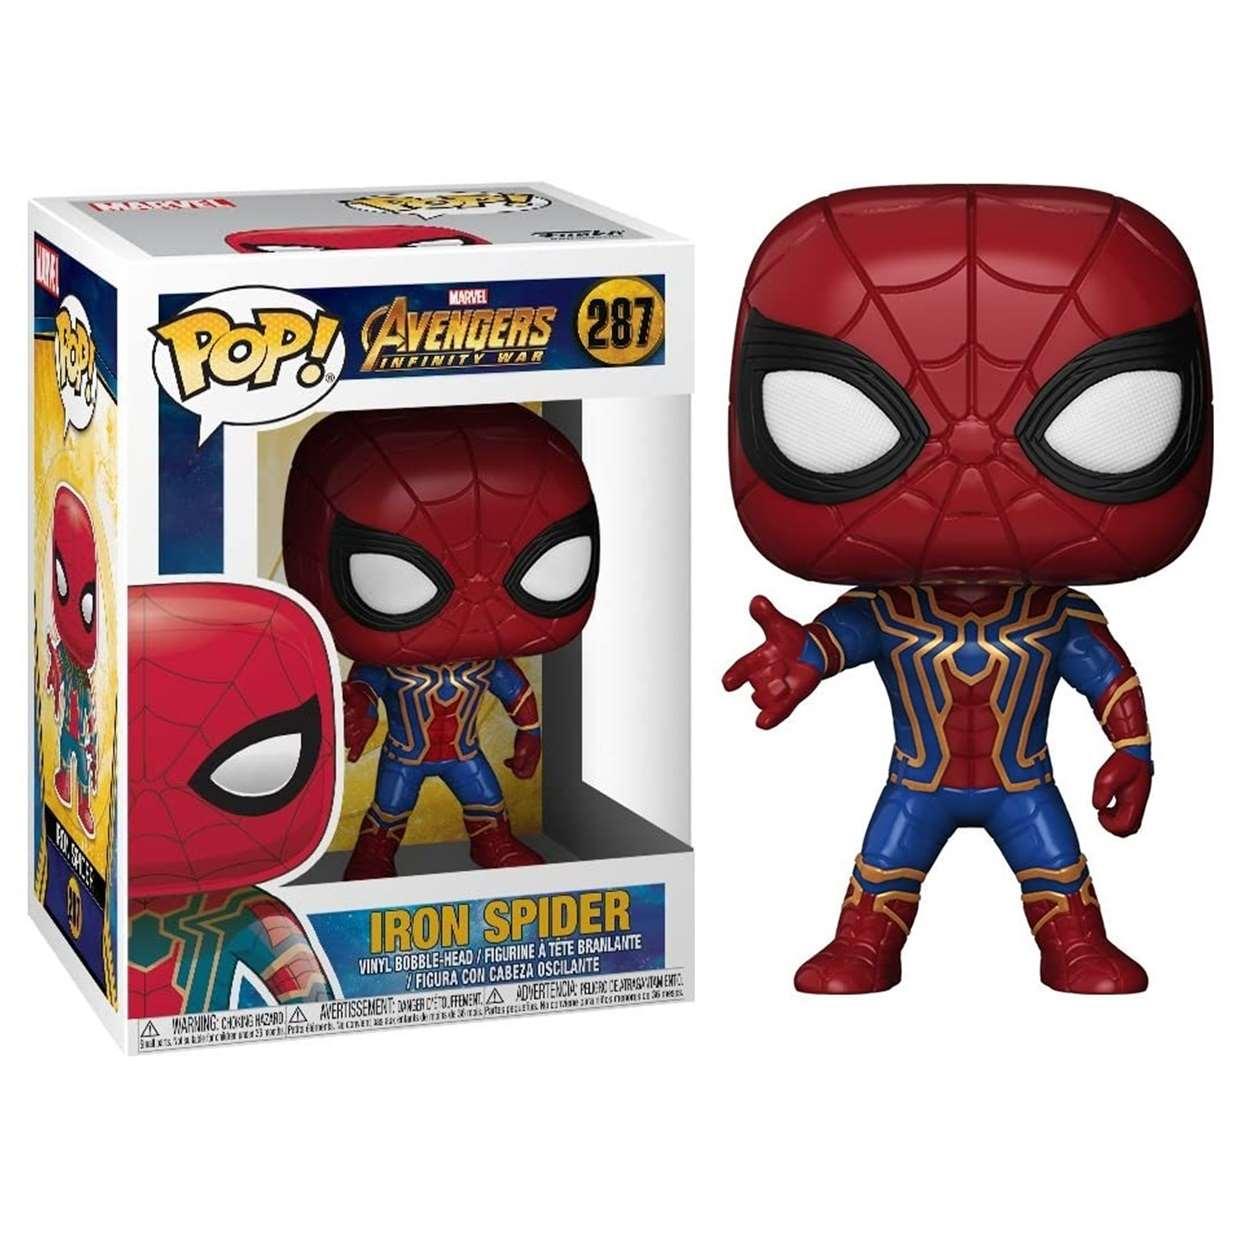 Iron Spider #287 Figura Avengers Infinity War Funko Pop!